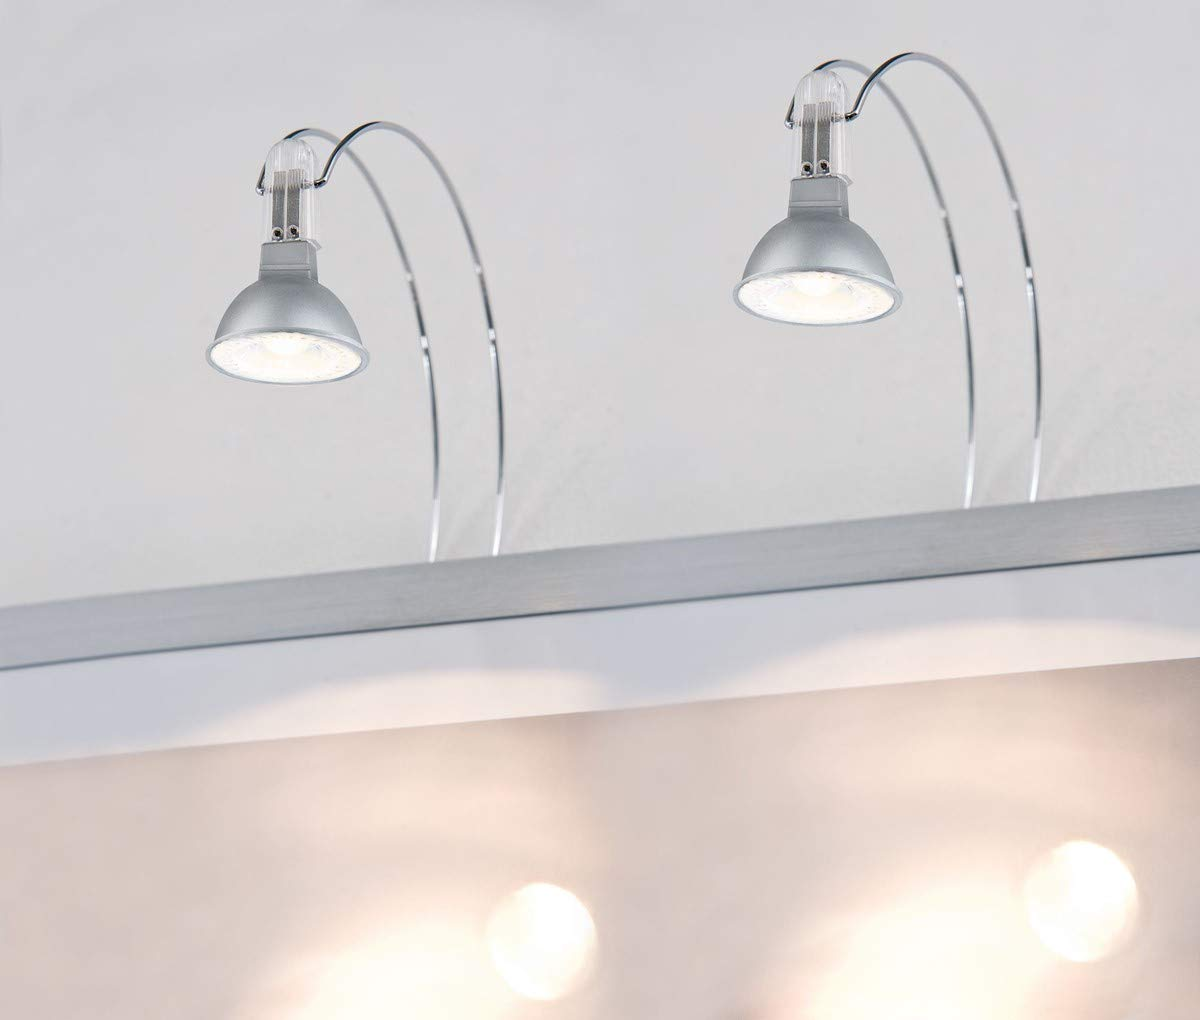 Paulmann 99908 Galeria LED II 2x4W GU5,3 Chrome 230//12V M/étal 8 W 2,5 x 18 x 30 cm